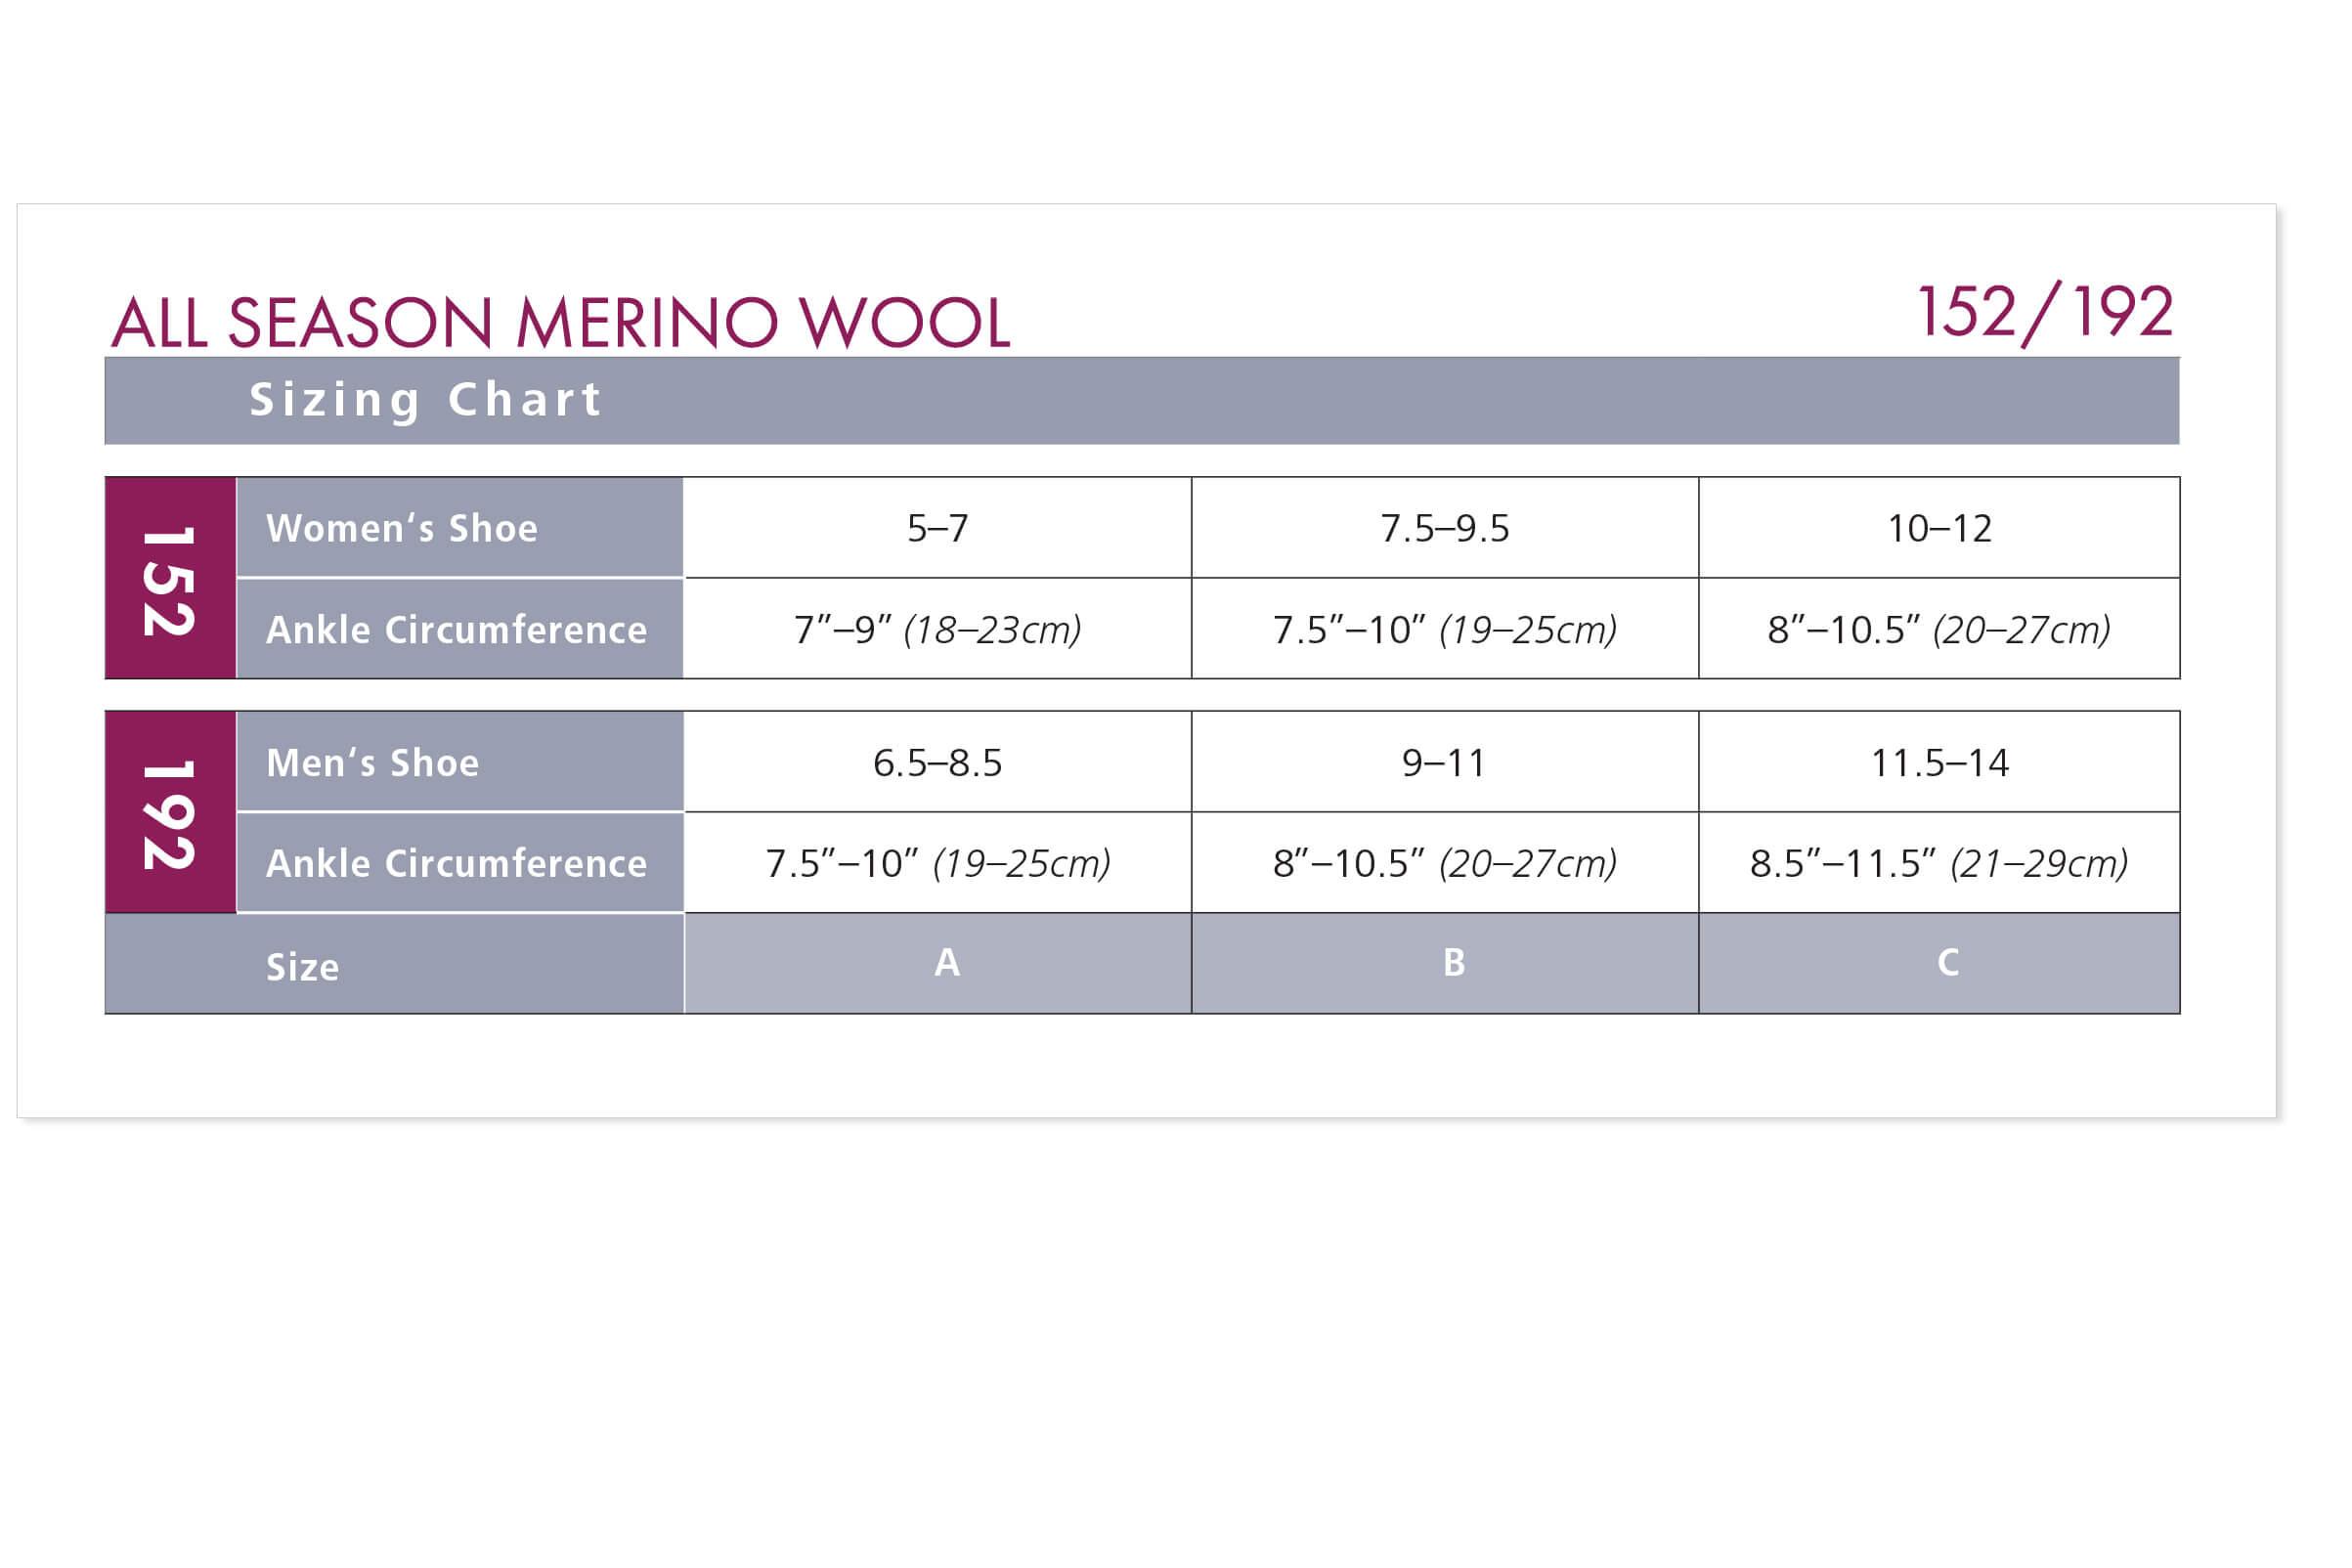 sigvaris-all-season-merino-wool-sizing-chart-3.jpg